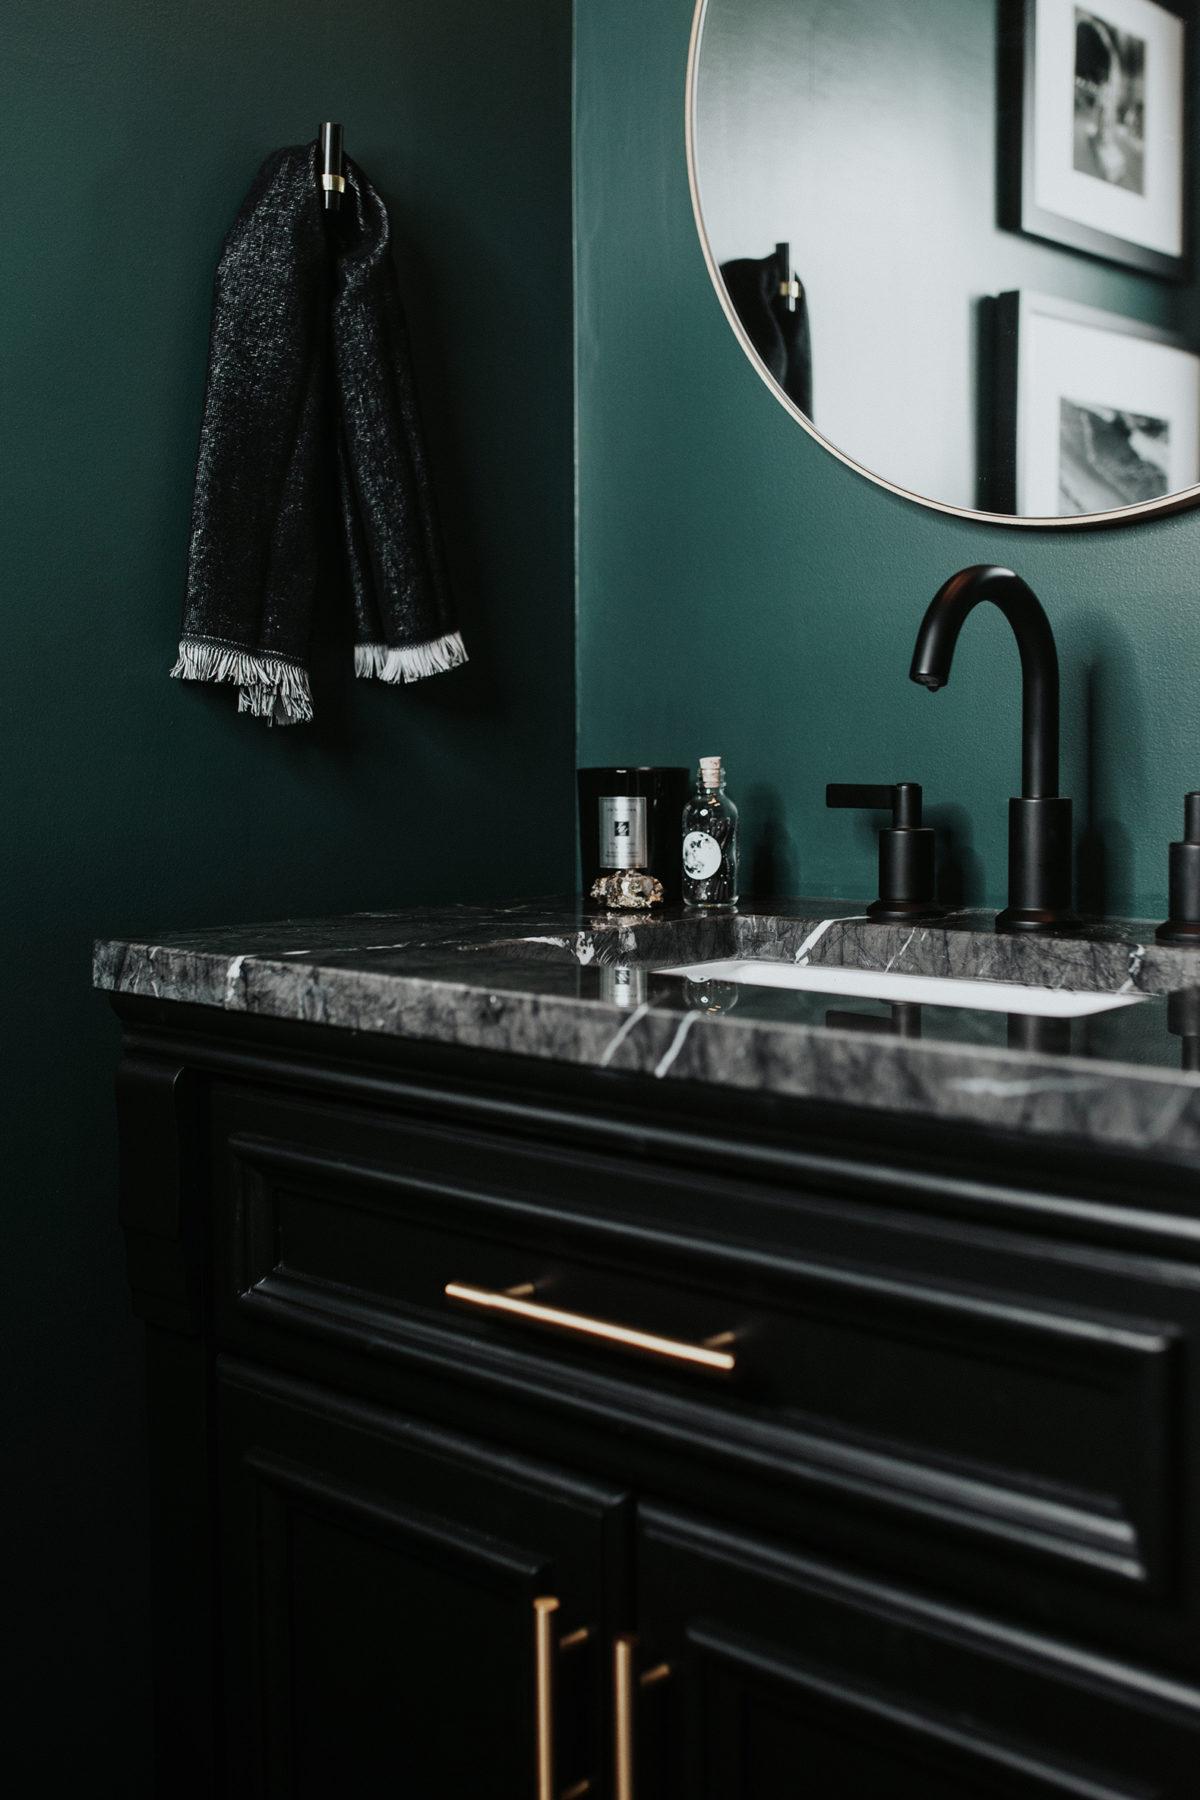 couleur sombre salle de bain peinture vert foncee